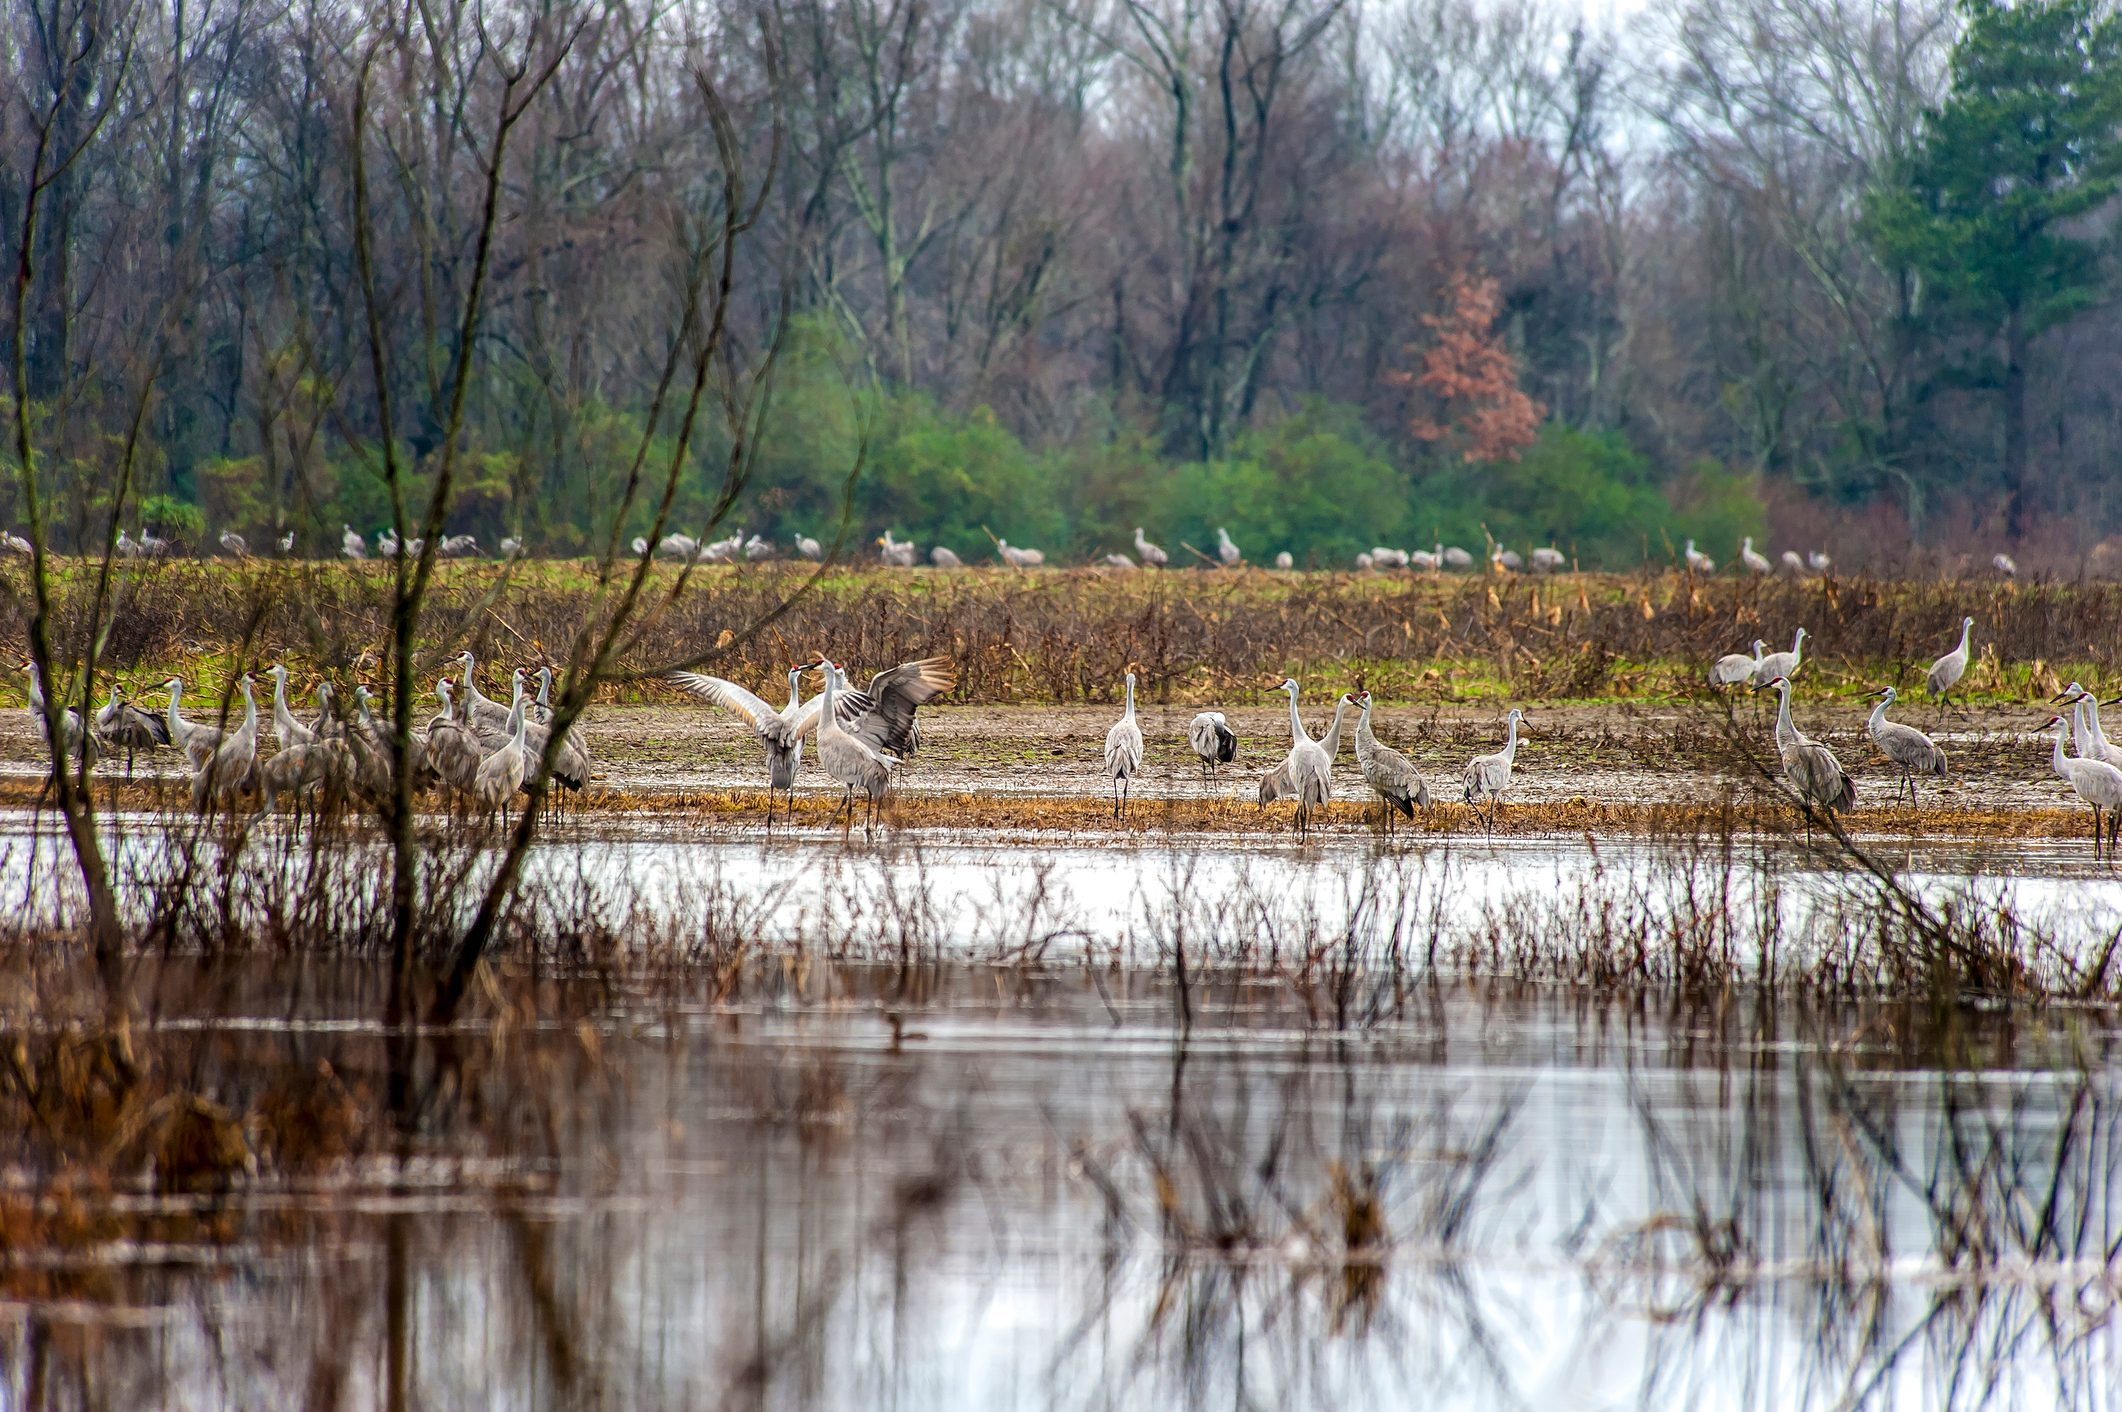 Sandhill Cranes at the Wheeler National Wildlife Refuge, Decatur, AL